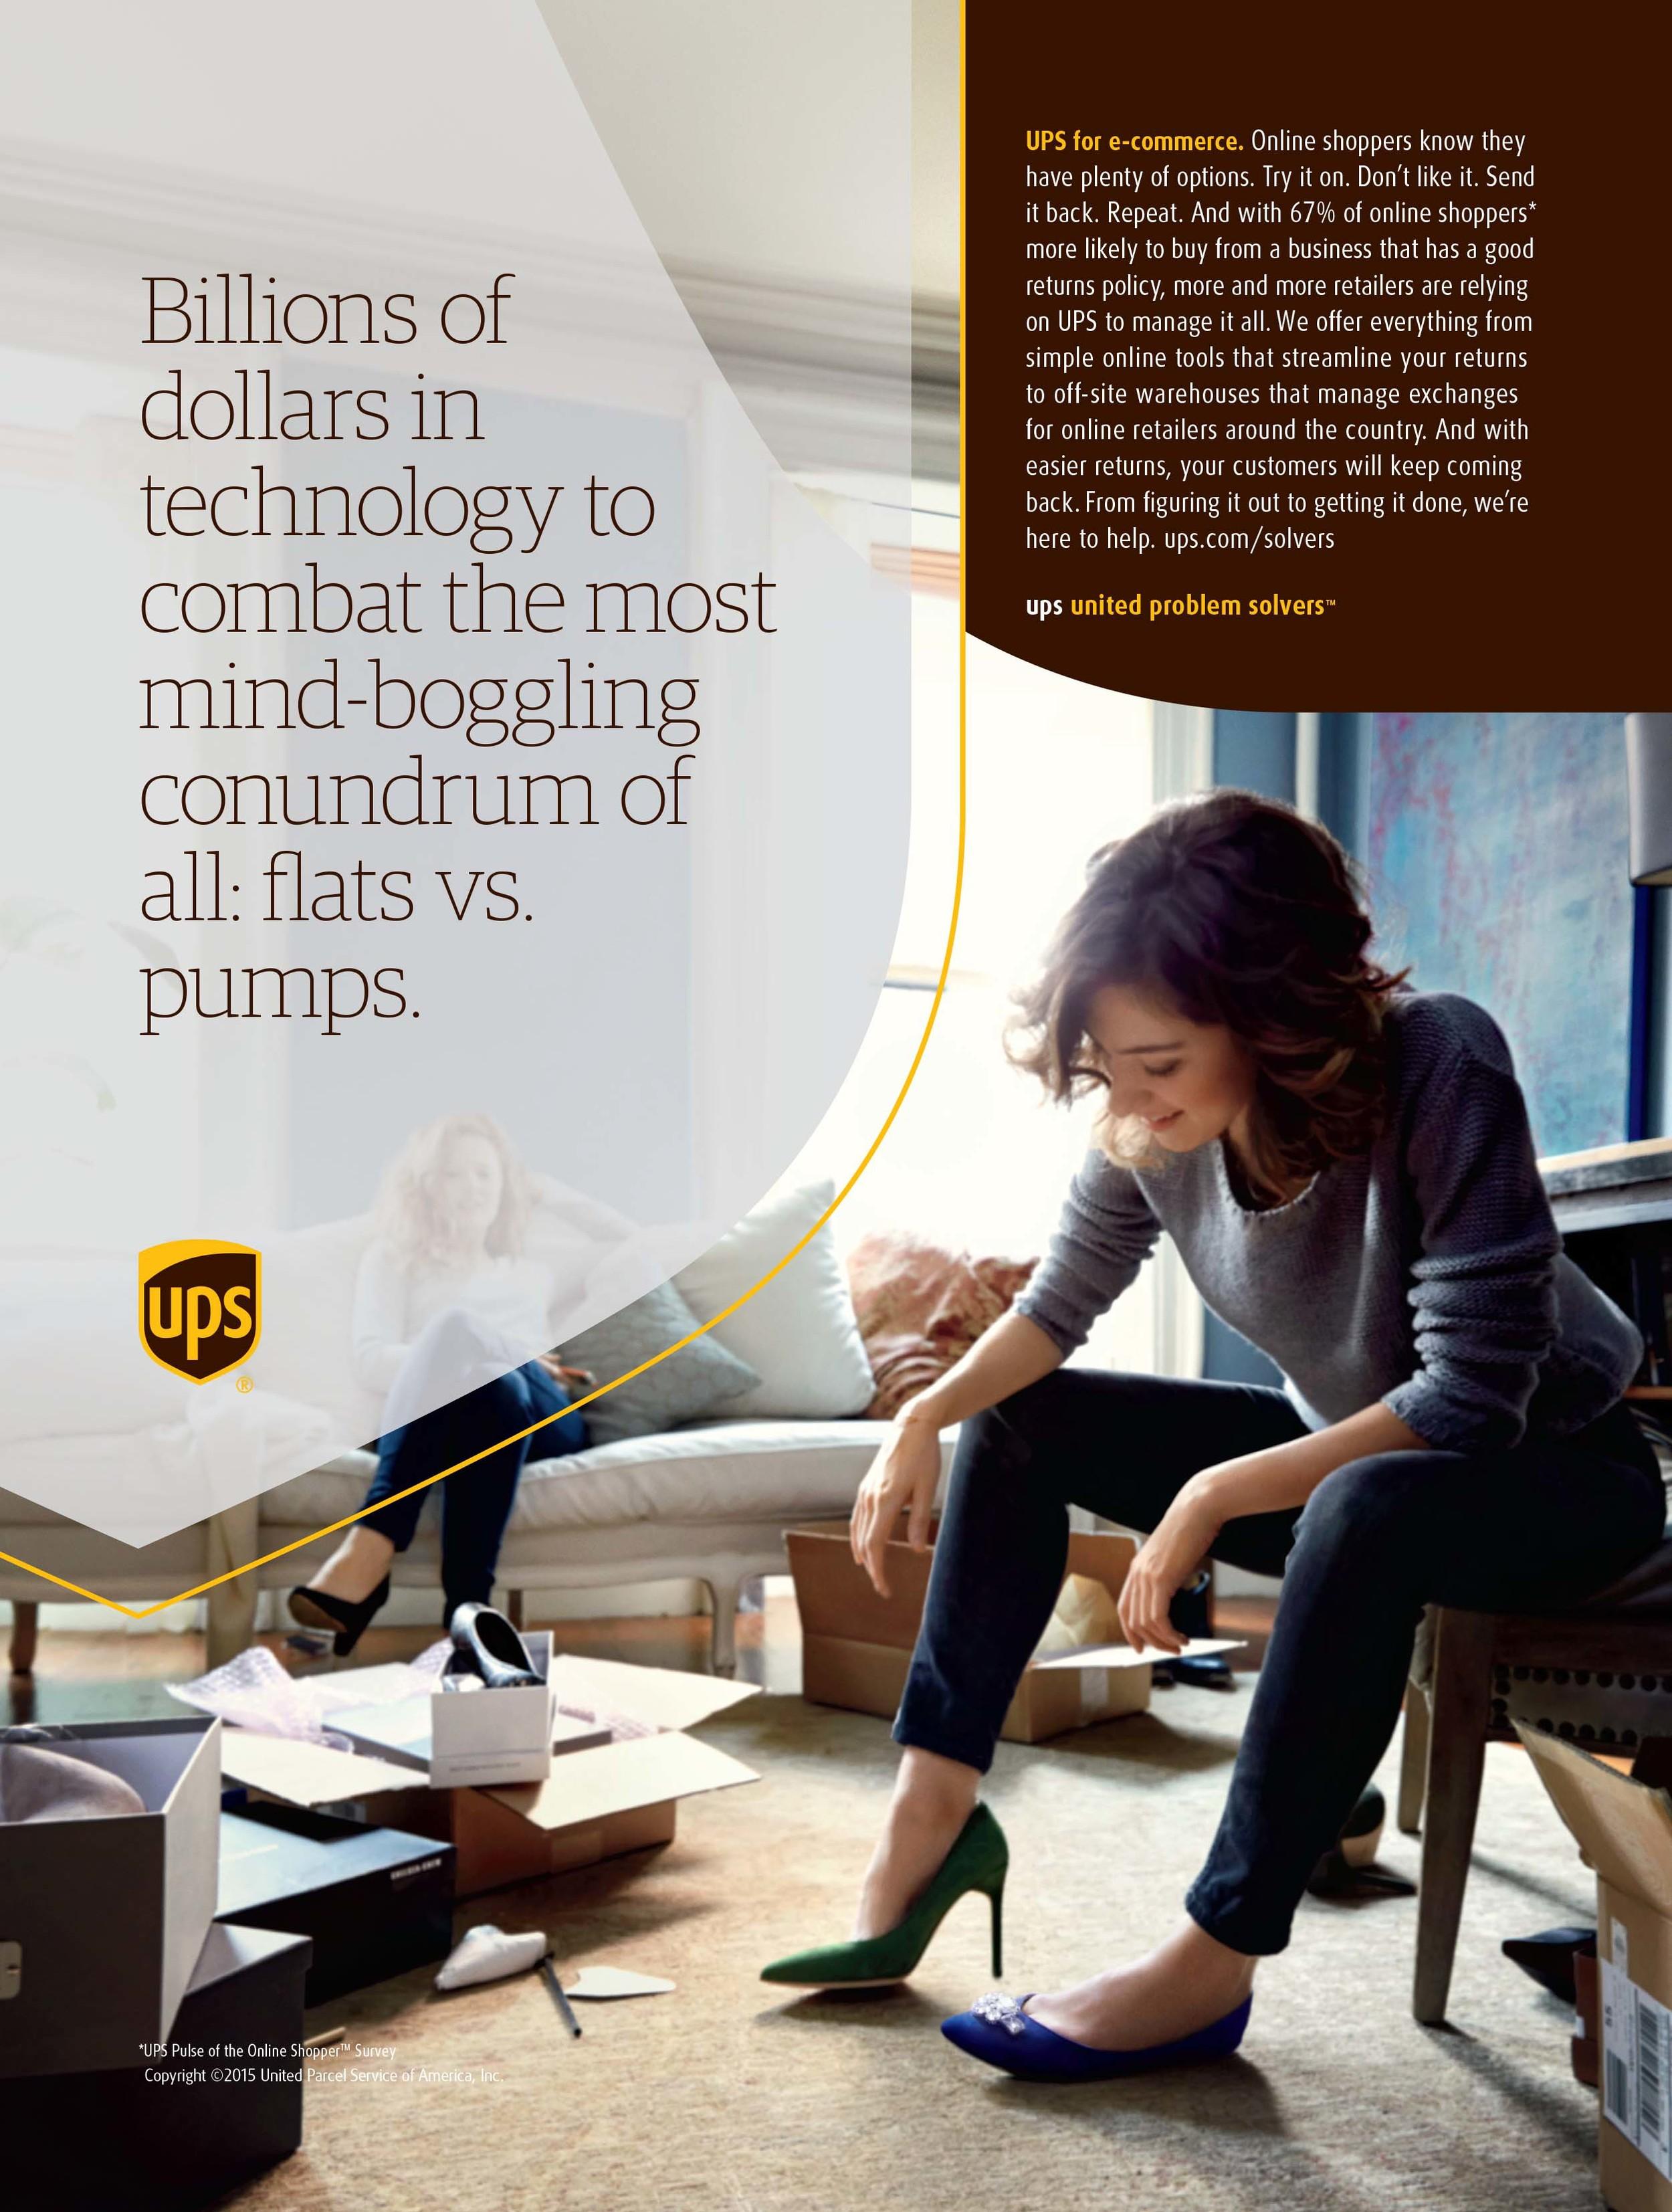 Proof UPS-15-5 copy.jpg